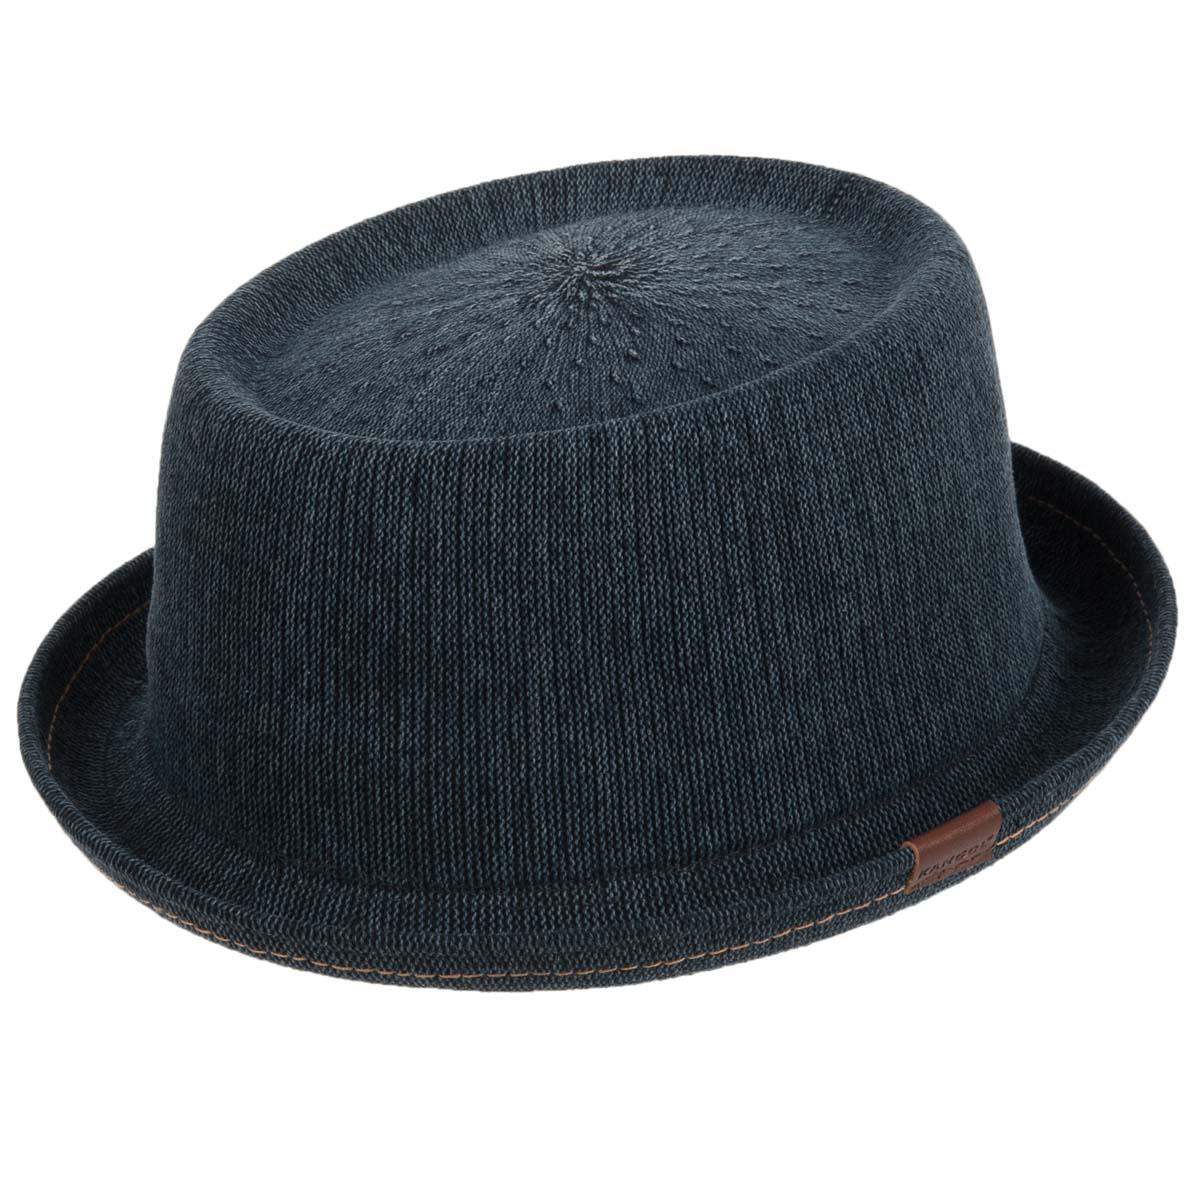 Cappello Pork Pie firmato KANGOL ... ee346f8ac8a2